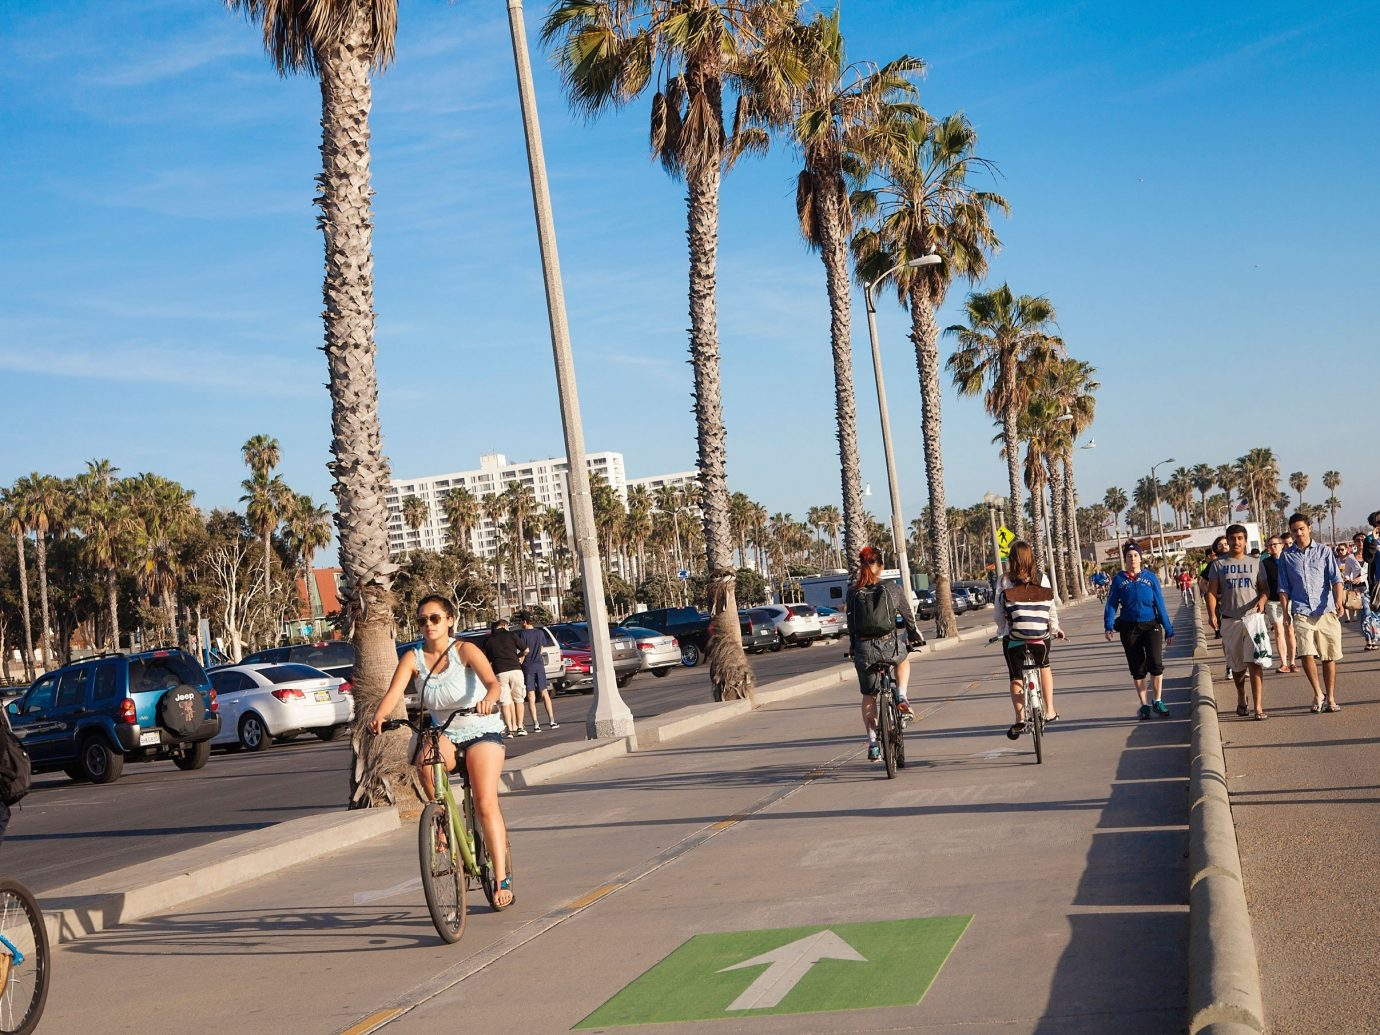 Budget sky road outdoor person walkway boardwalk street sports tourism cycling endurance sports people endurance athletics pedestrian palm